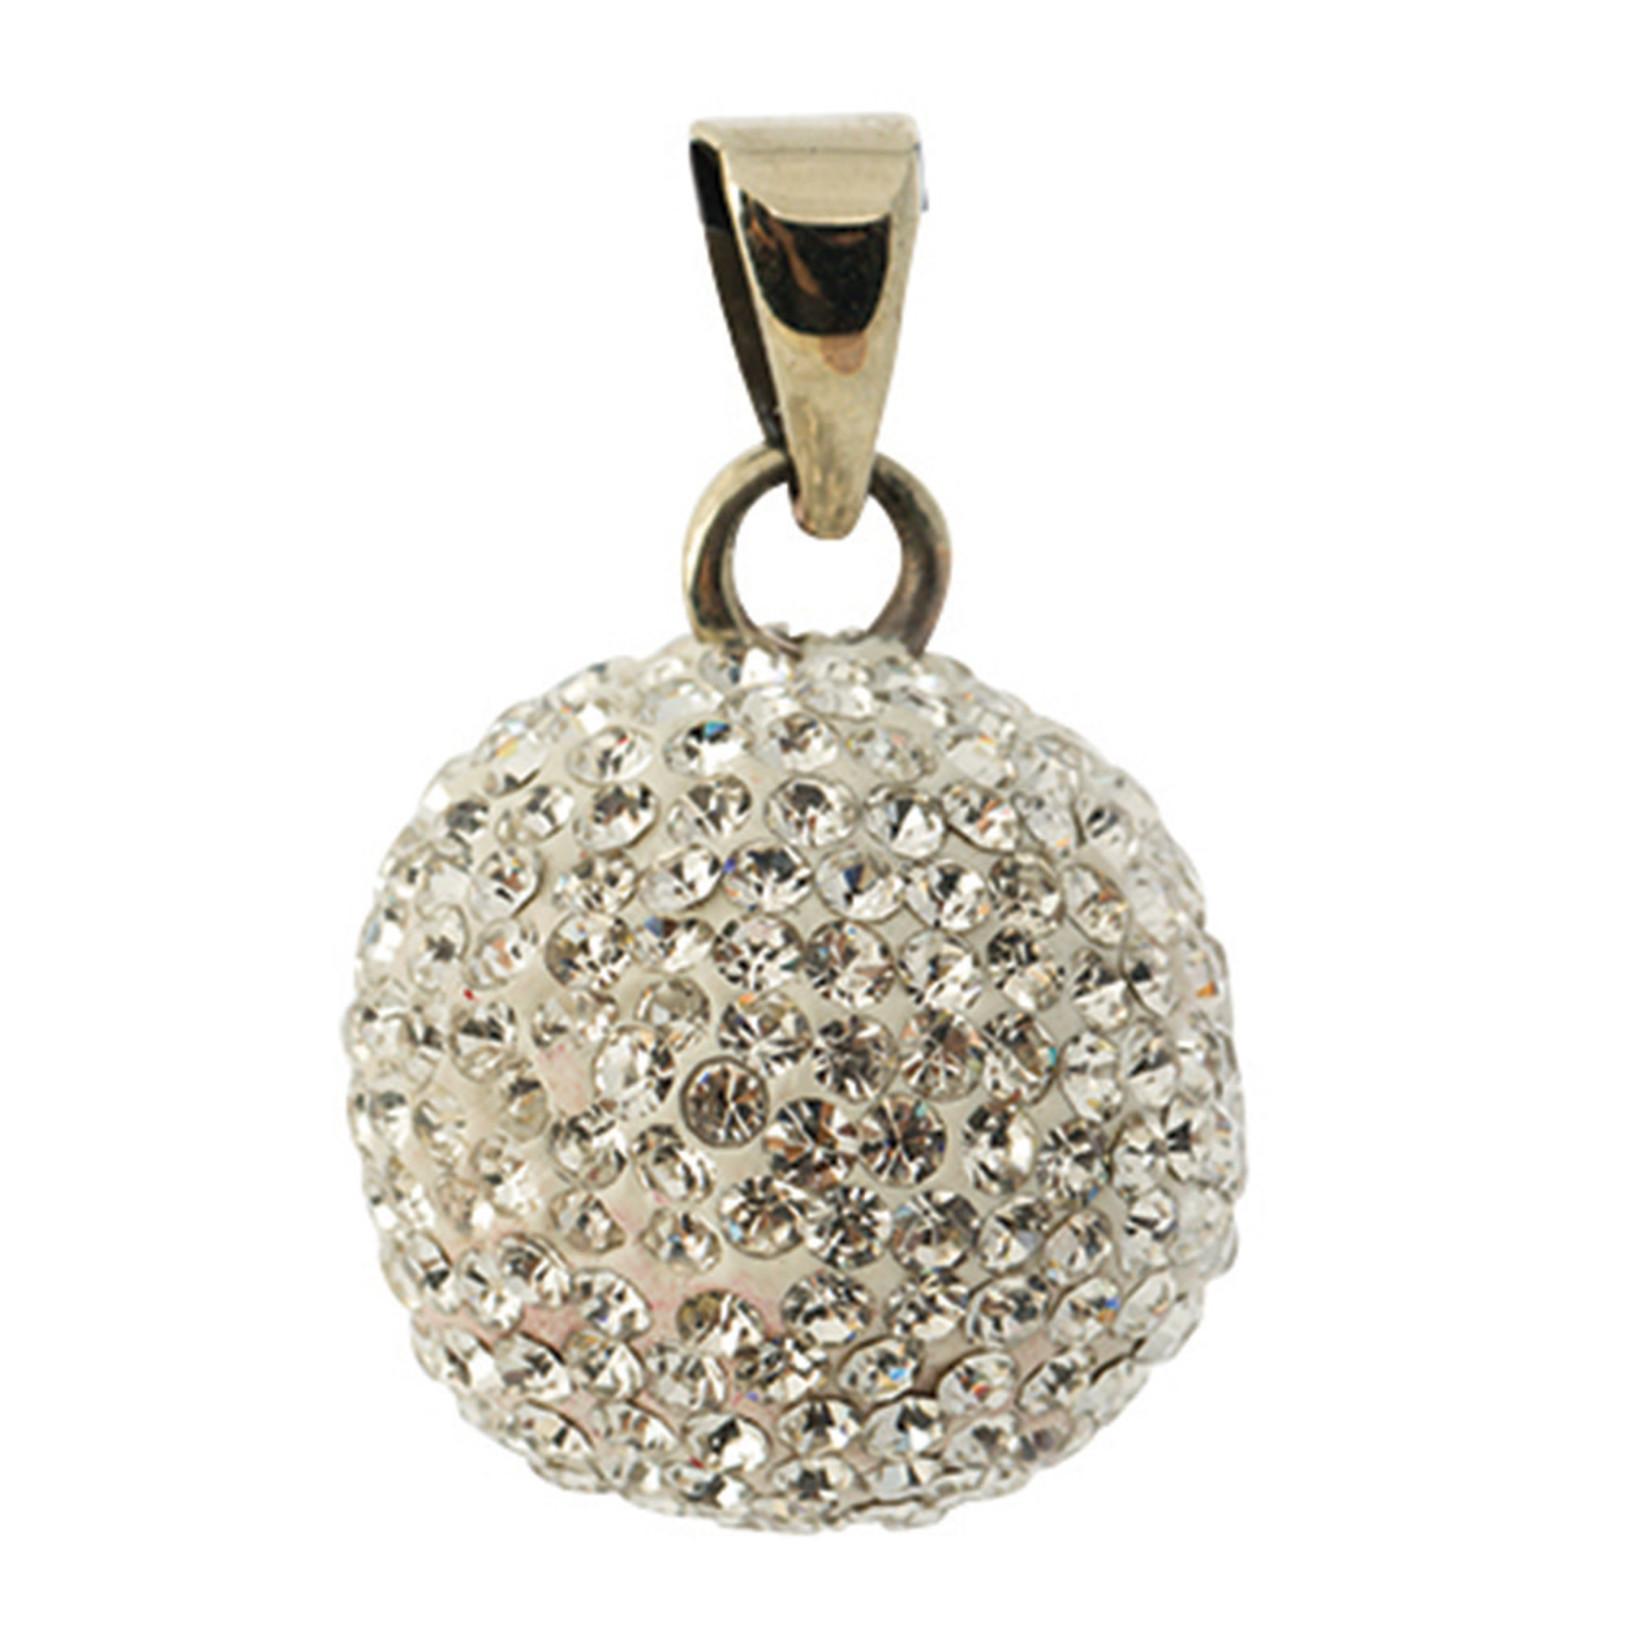 Bola Bola - Babylonia Bola - Verzilverd met glitter steentjes - One size